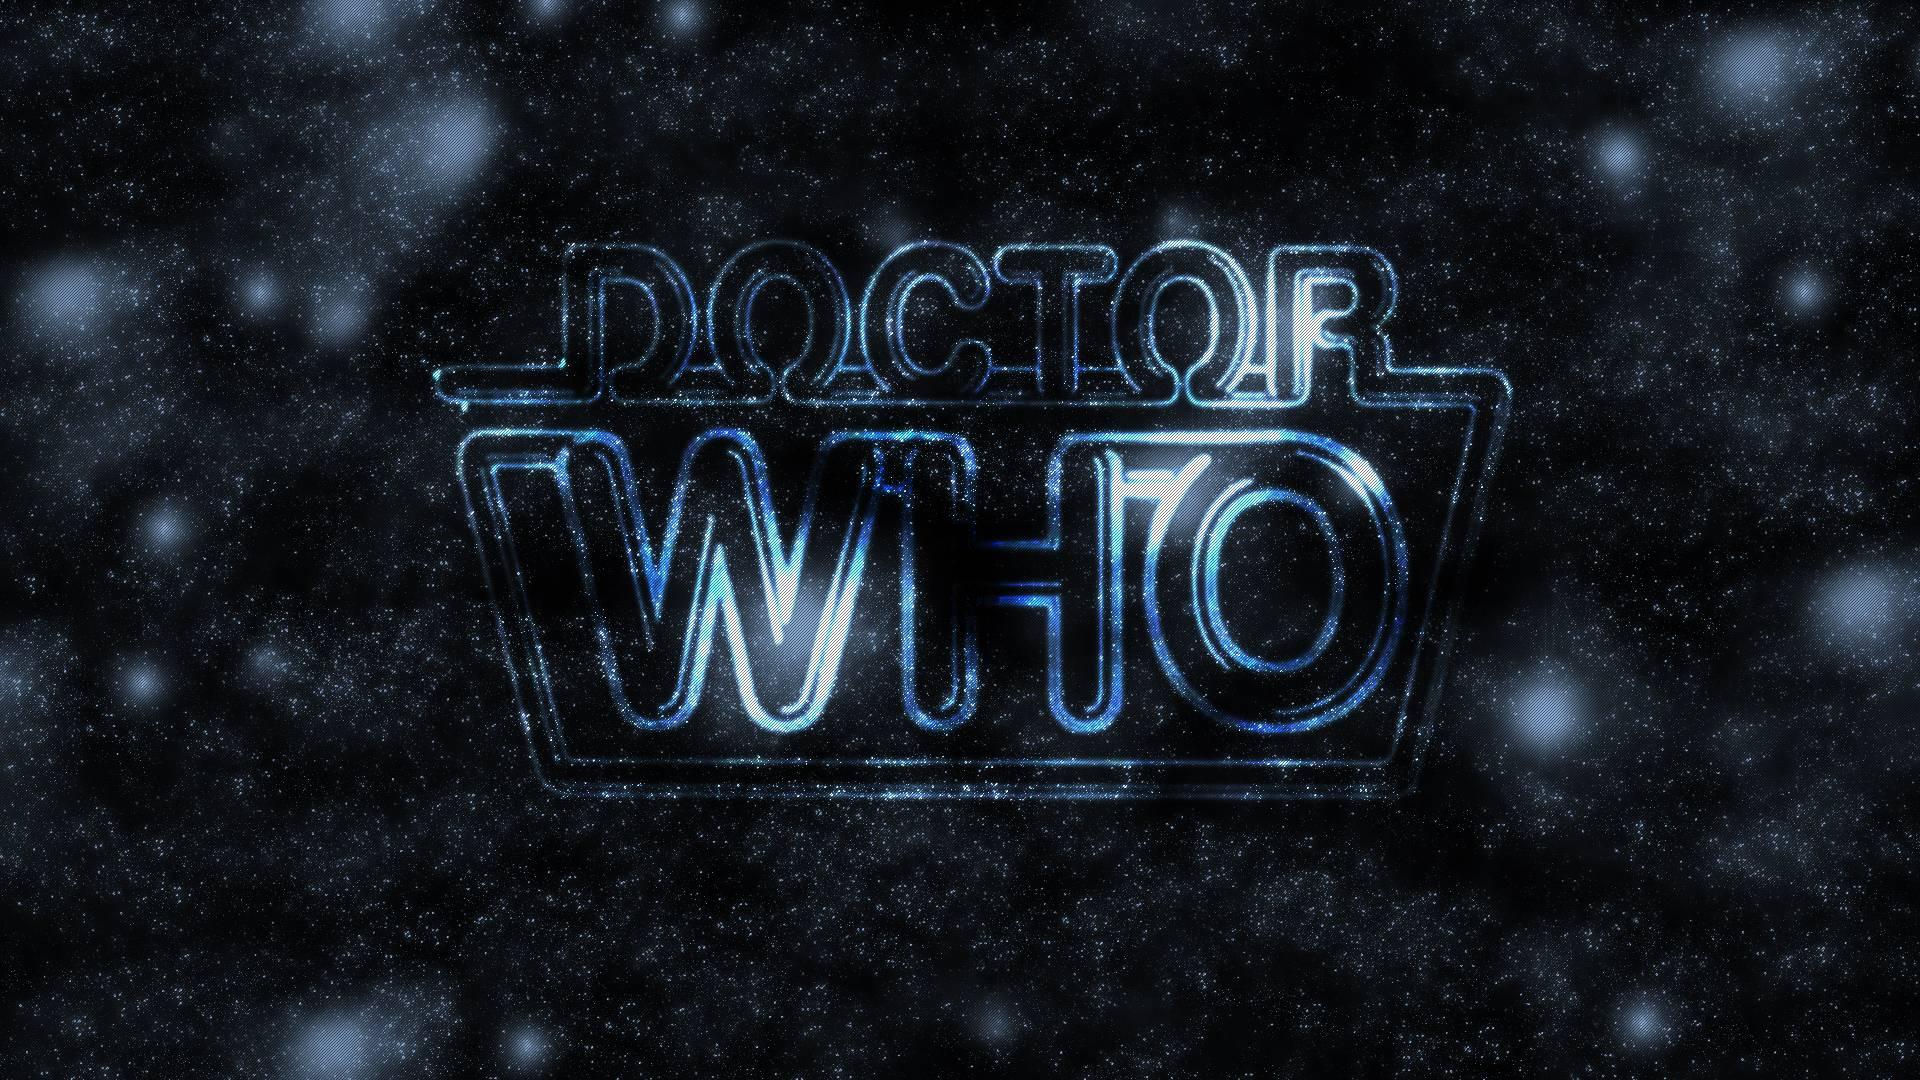 Doctor Who Desktop Wallpaper Hd 2